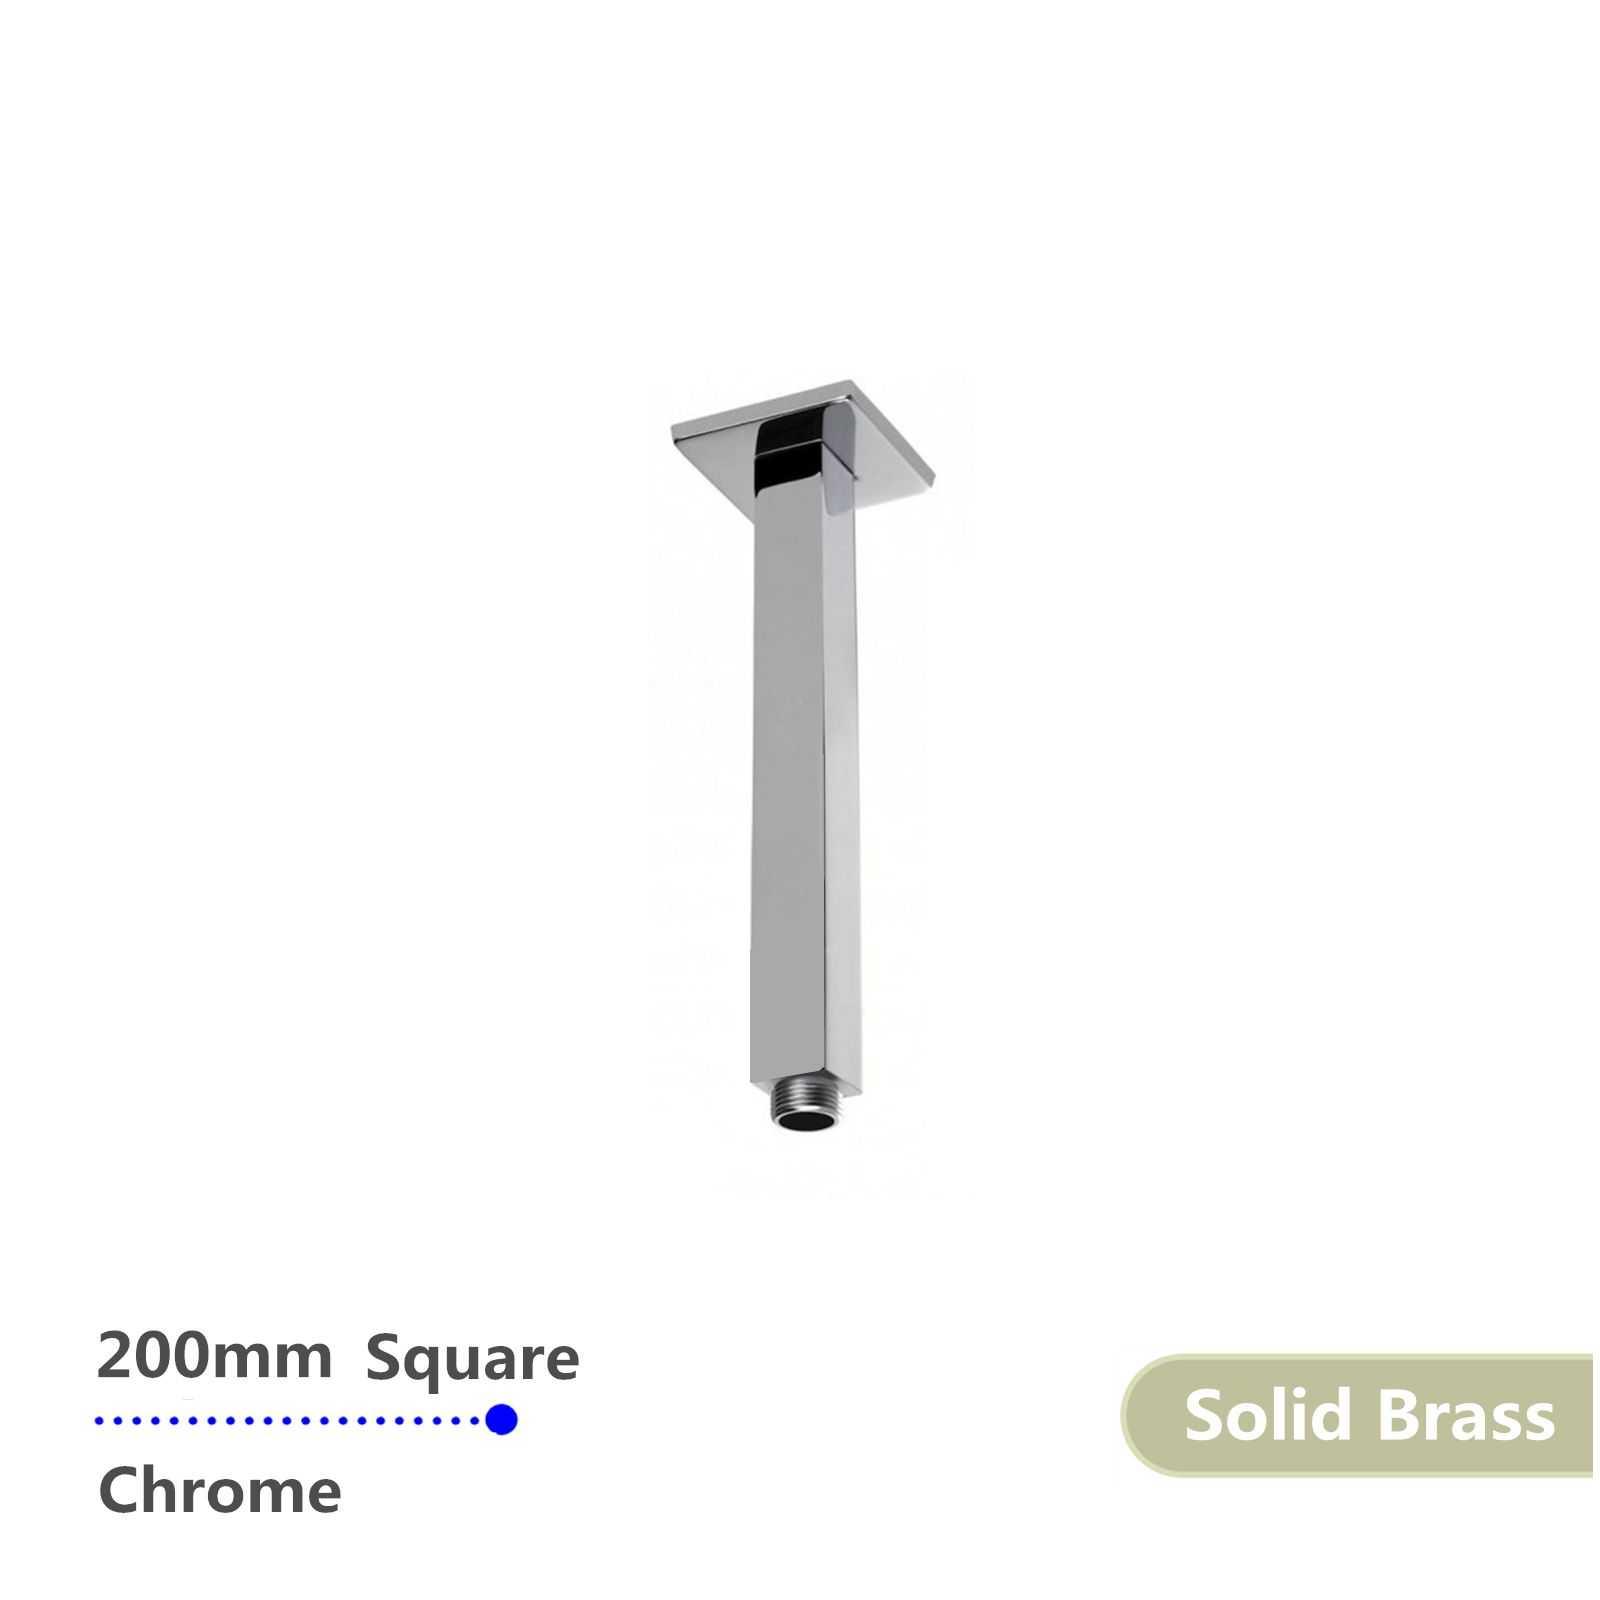 Square Chrome Ceiling Shower Arm 200mm